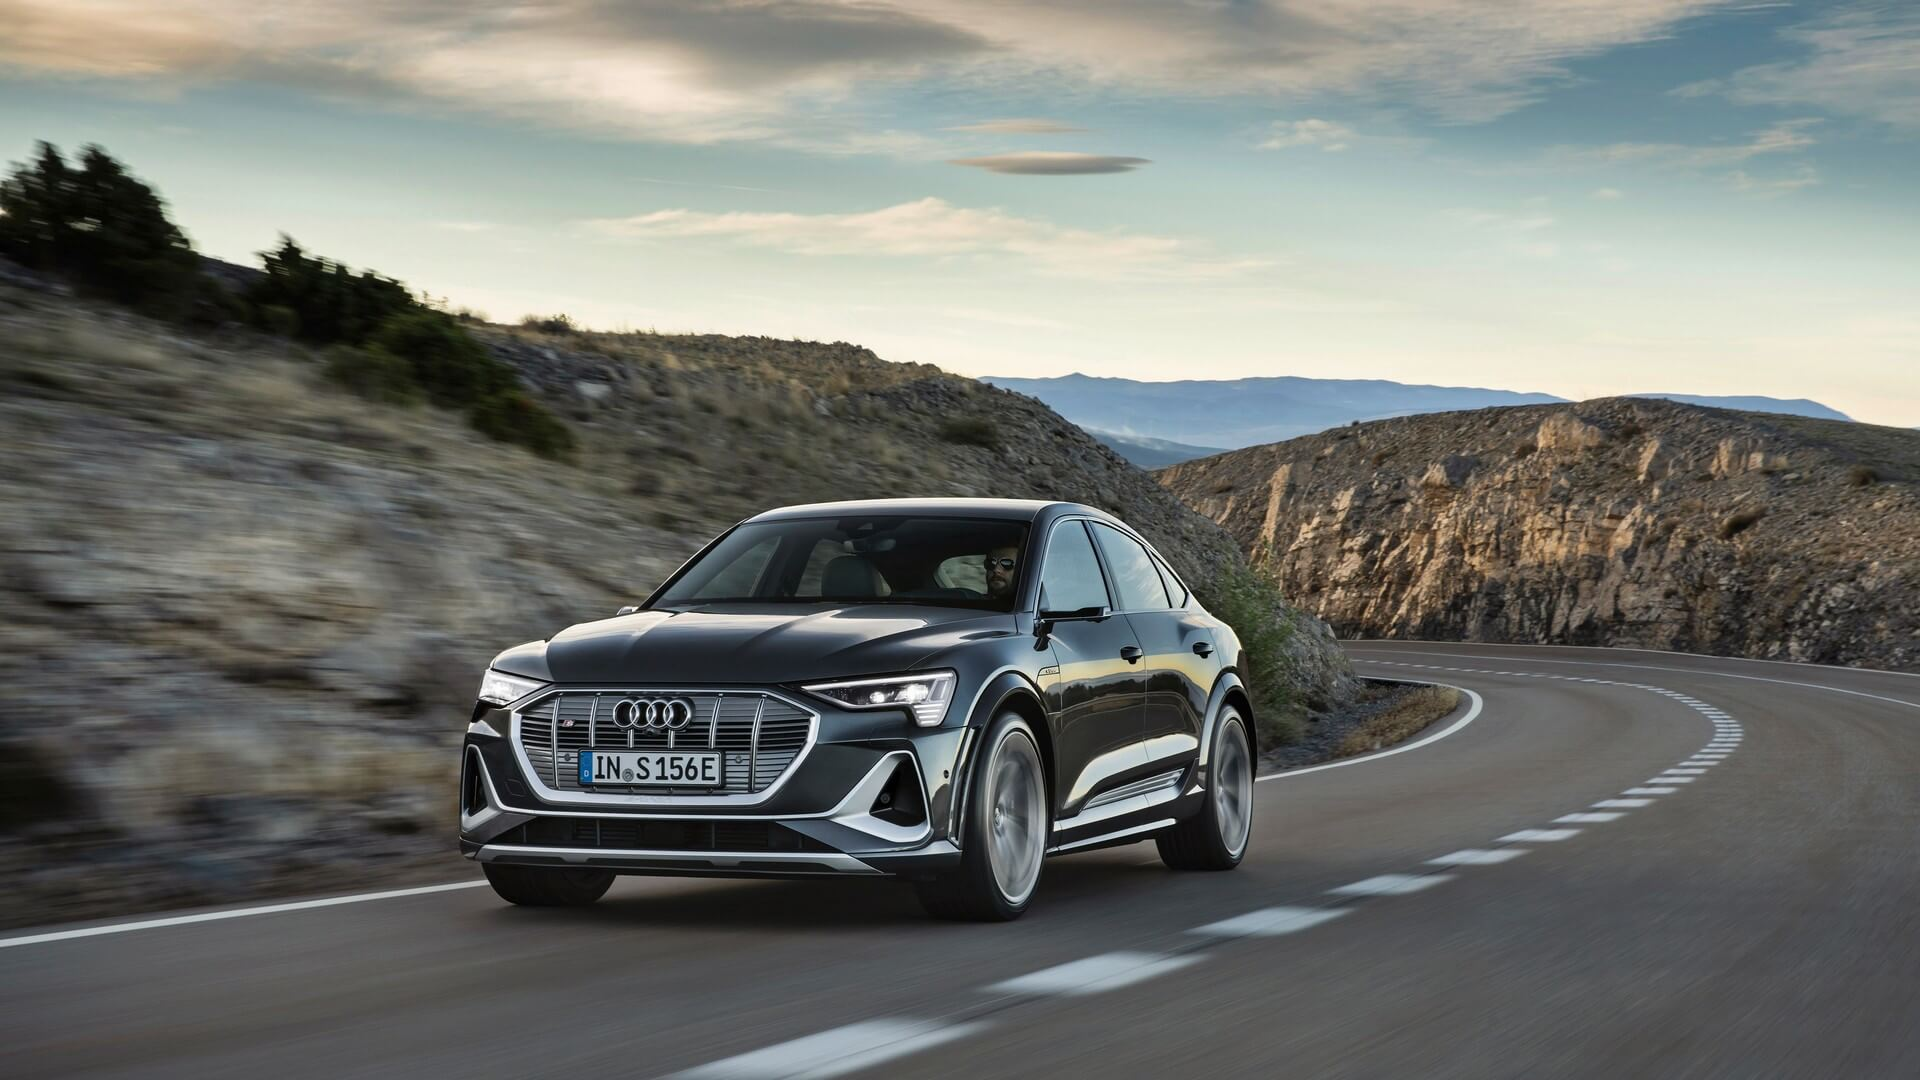 Audi-E-Tron-S-and-E-Tron-S-Sportback-2020-59